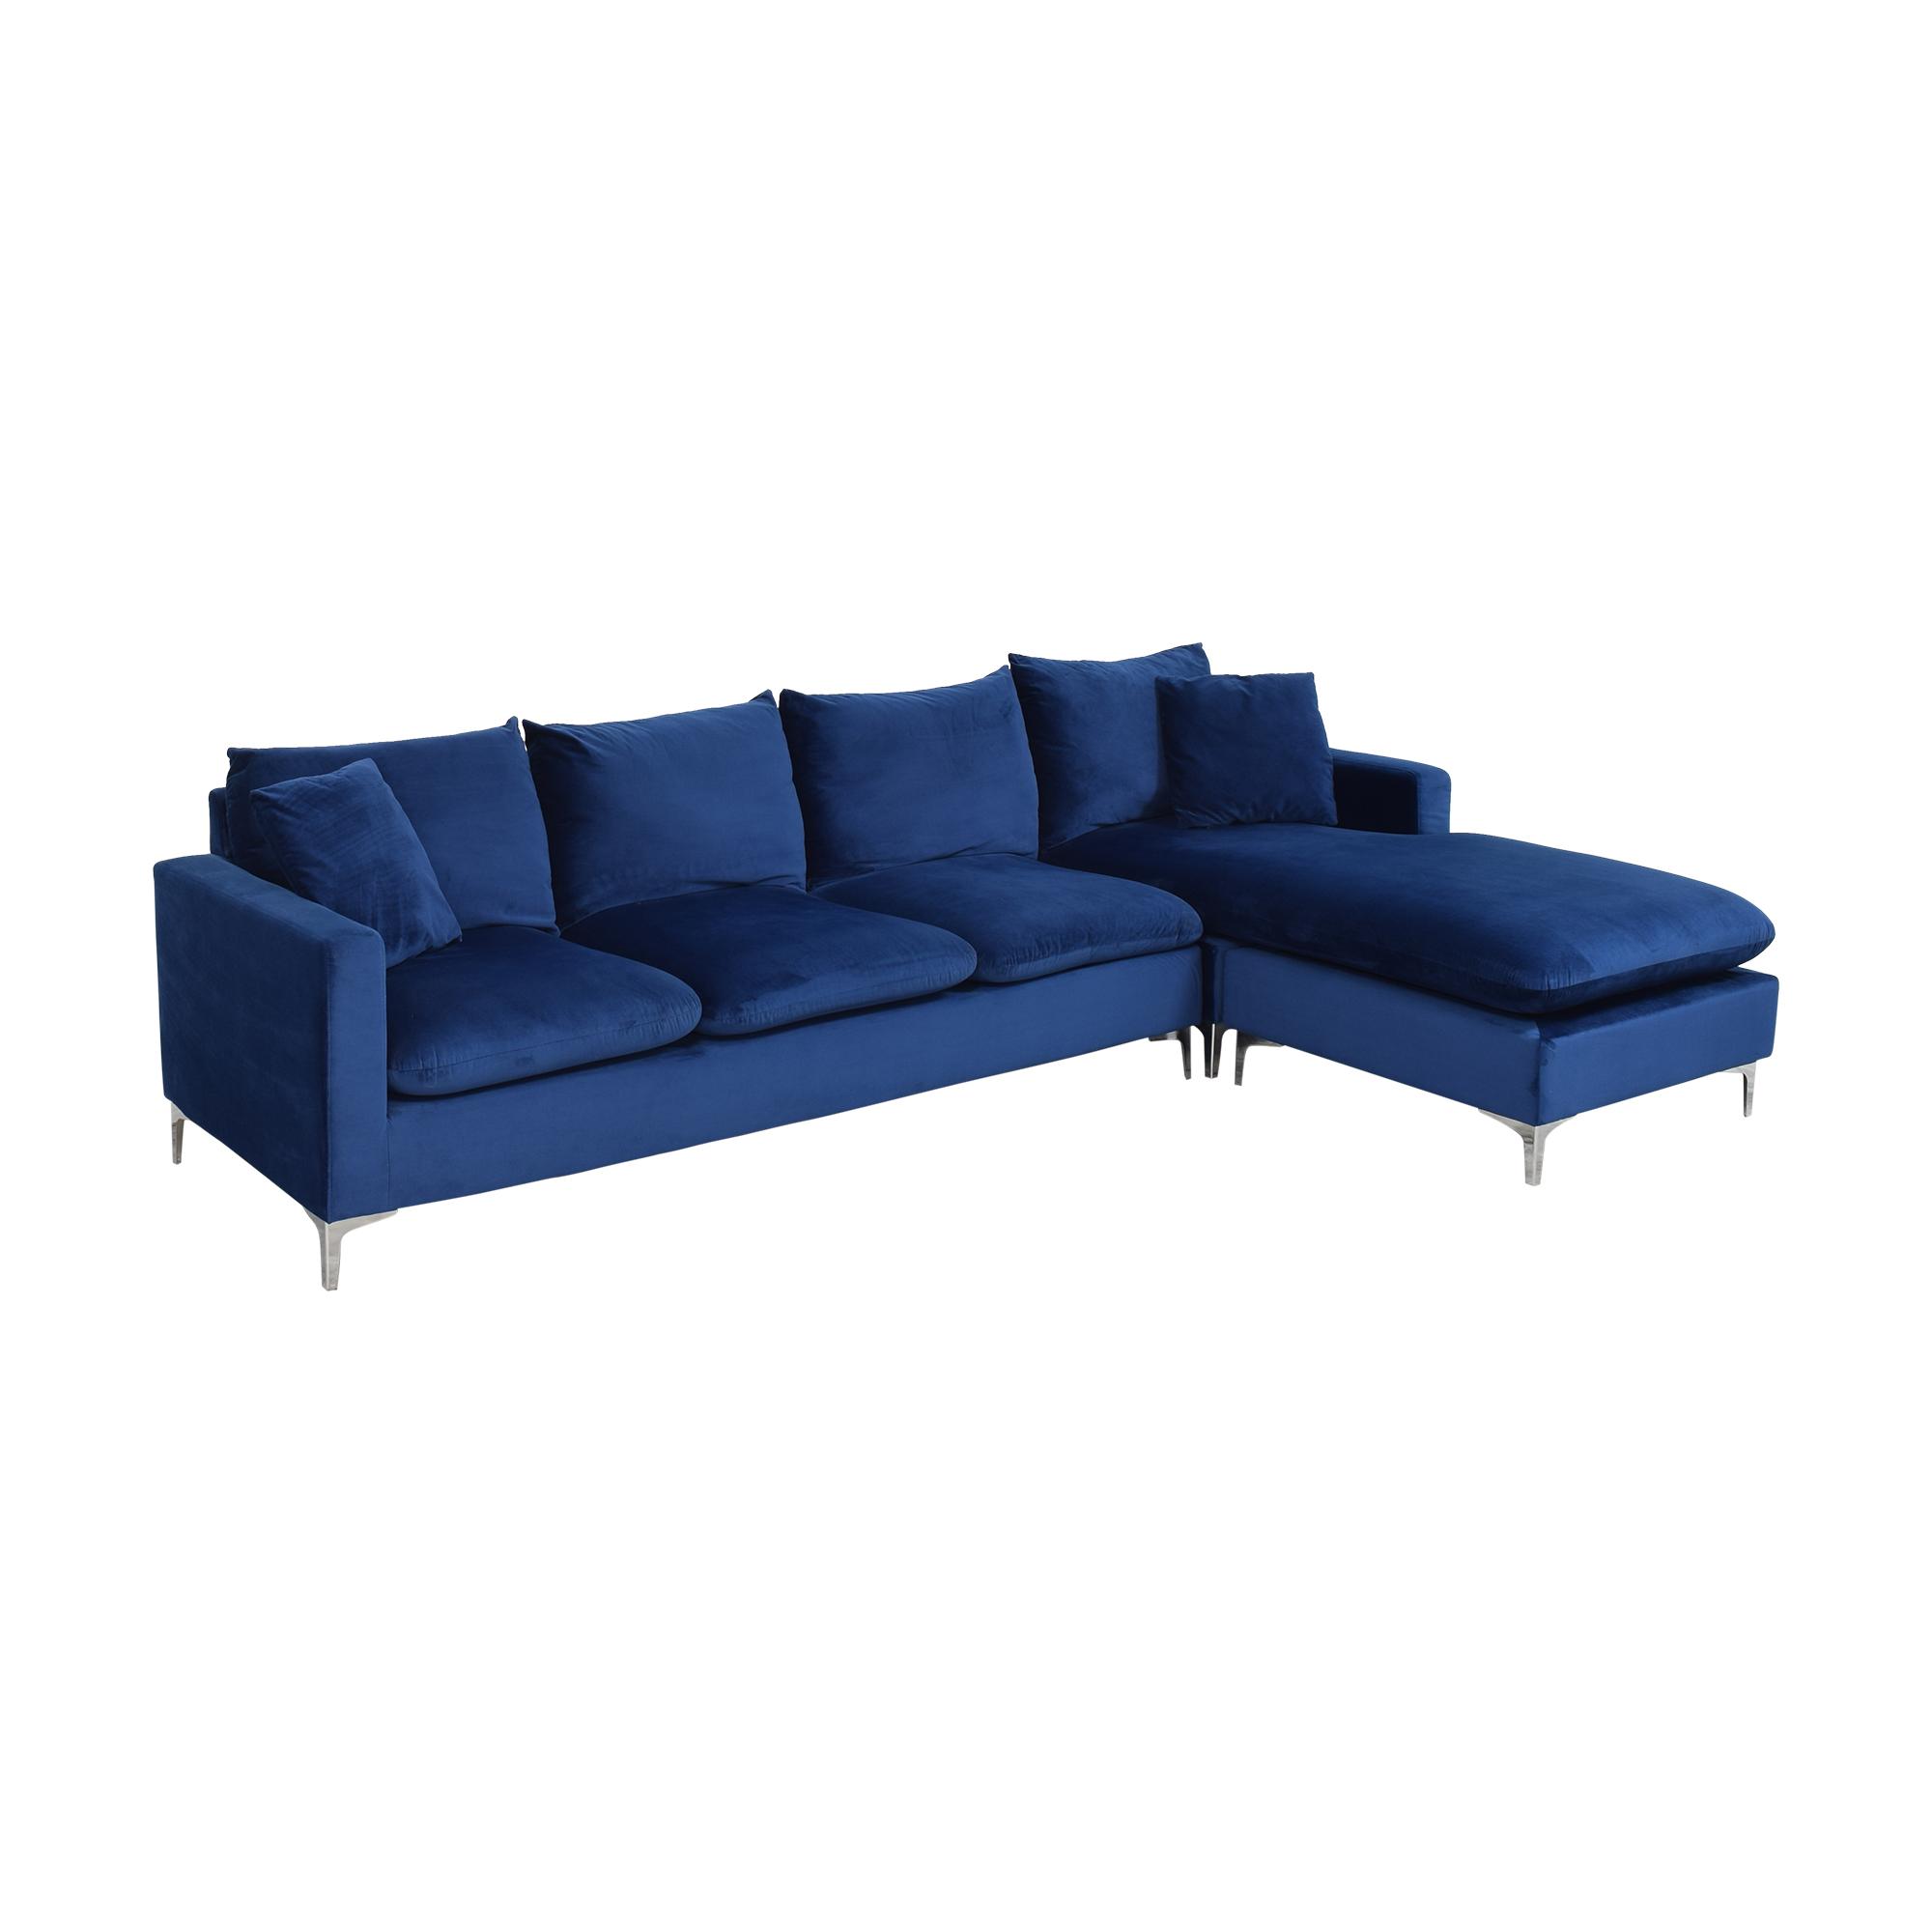 Wayfair Wayfair Boutwell Reversible Sectional Sofa blue